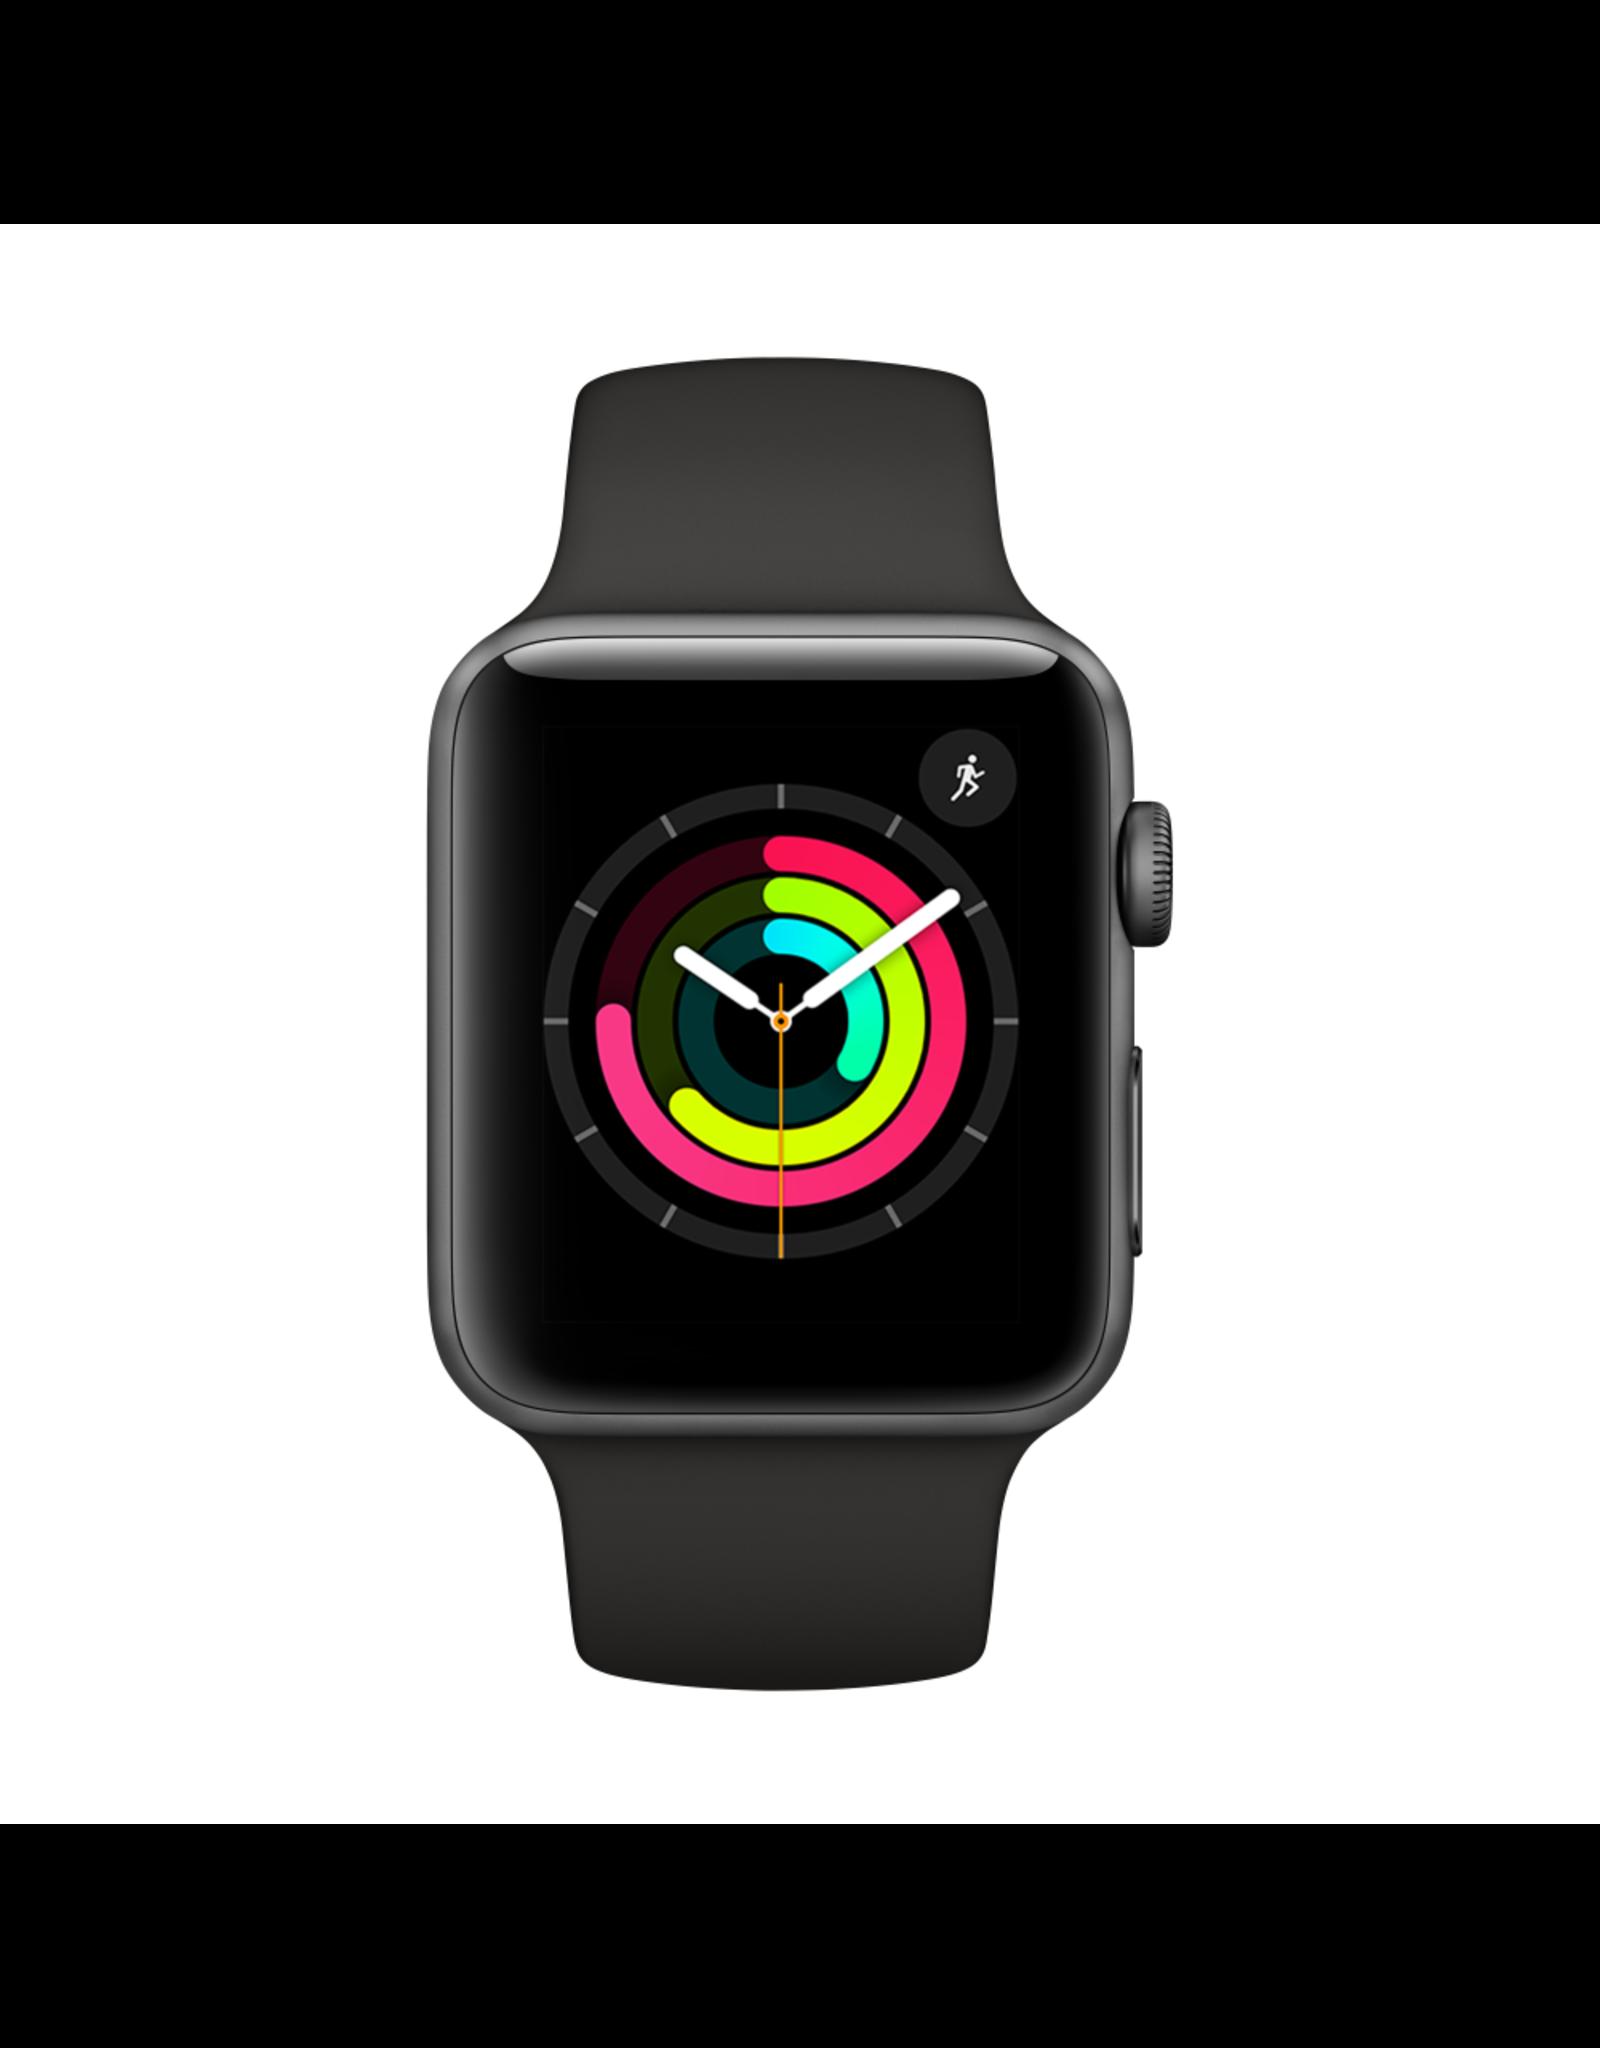 Apple Apple Watch Series 3 GPS